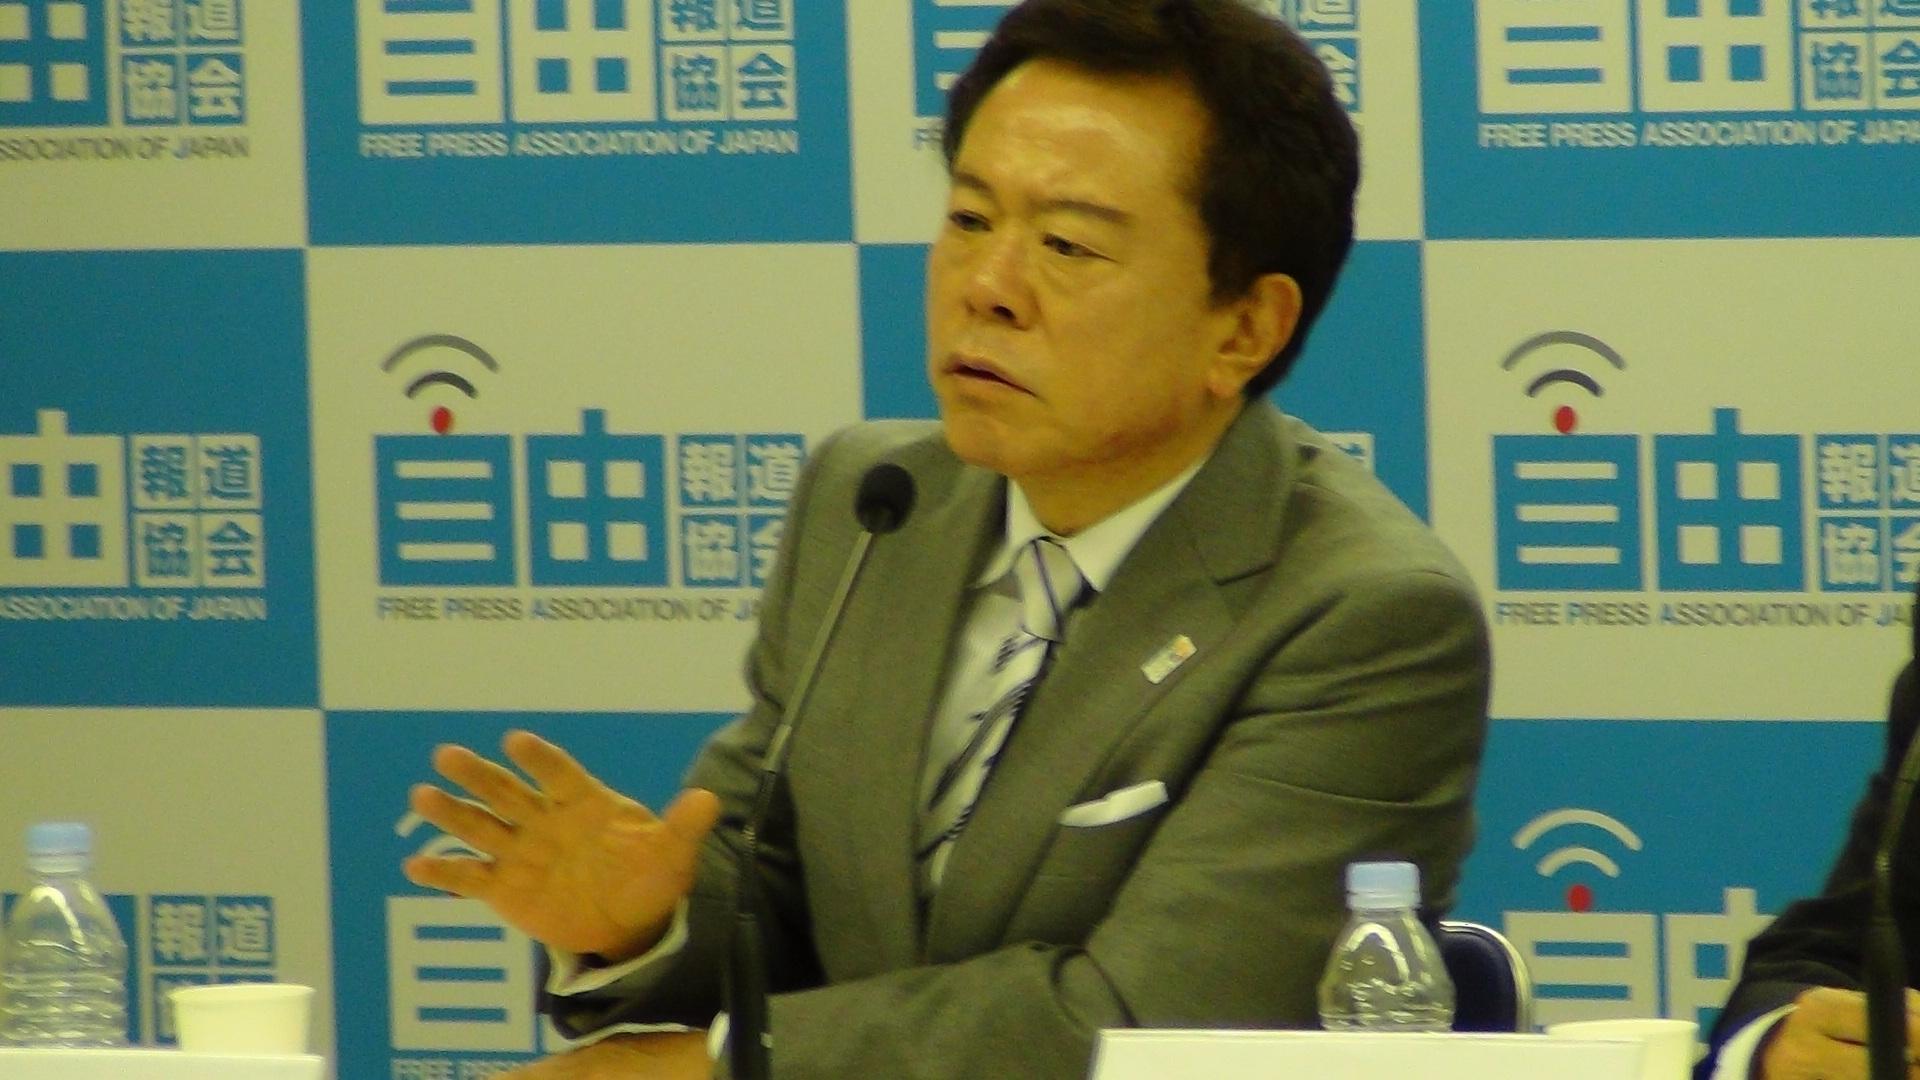 http://daily.magazine9.jp/m9/oshidori/DSC01195%5B1%5D.JPG